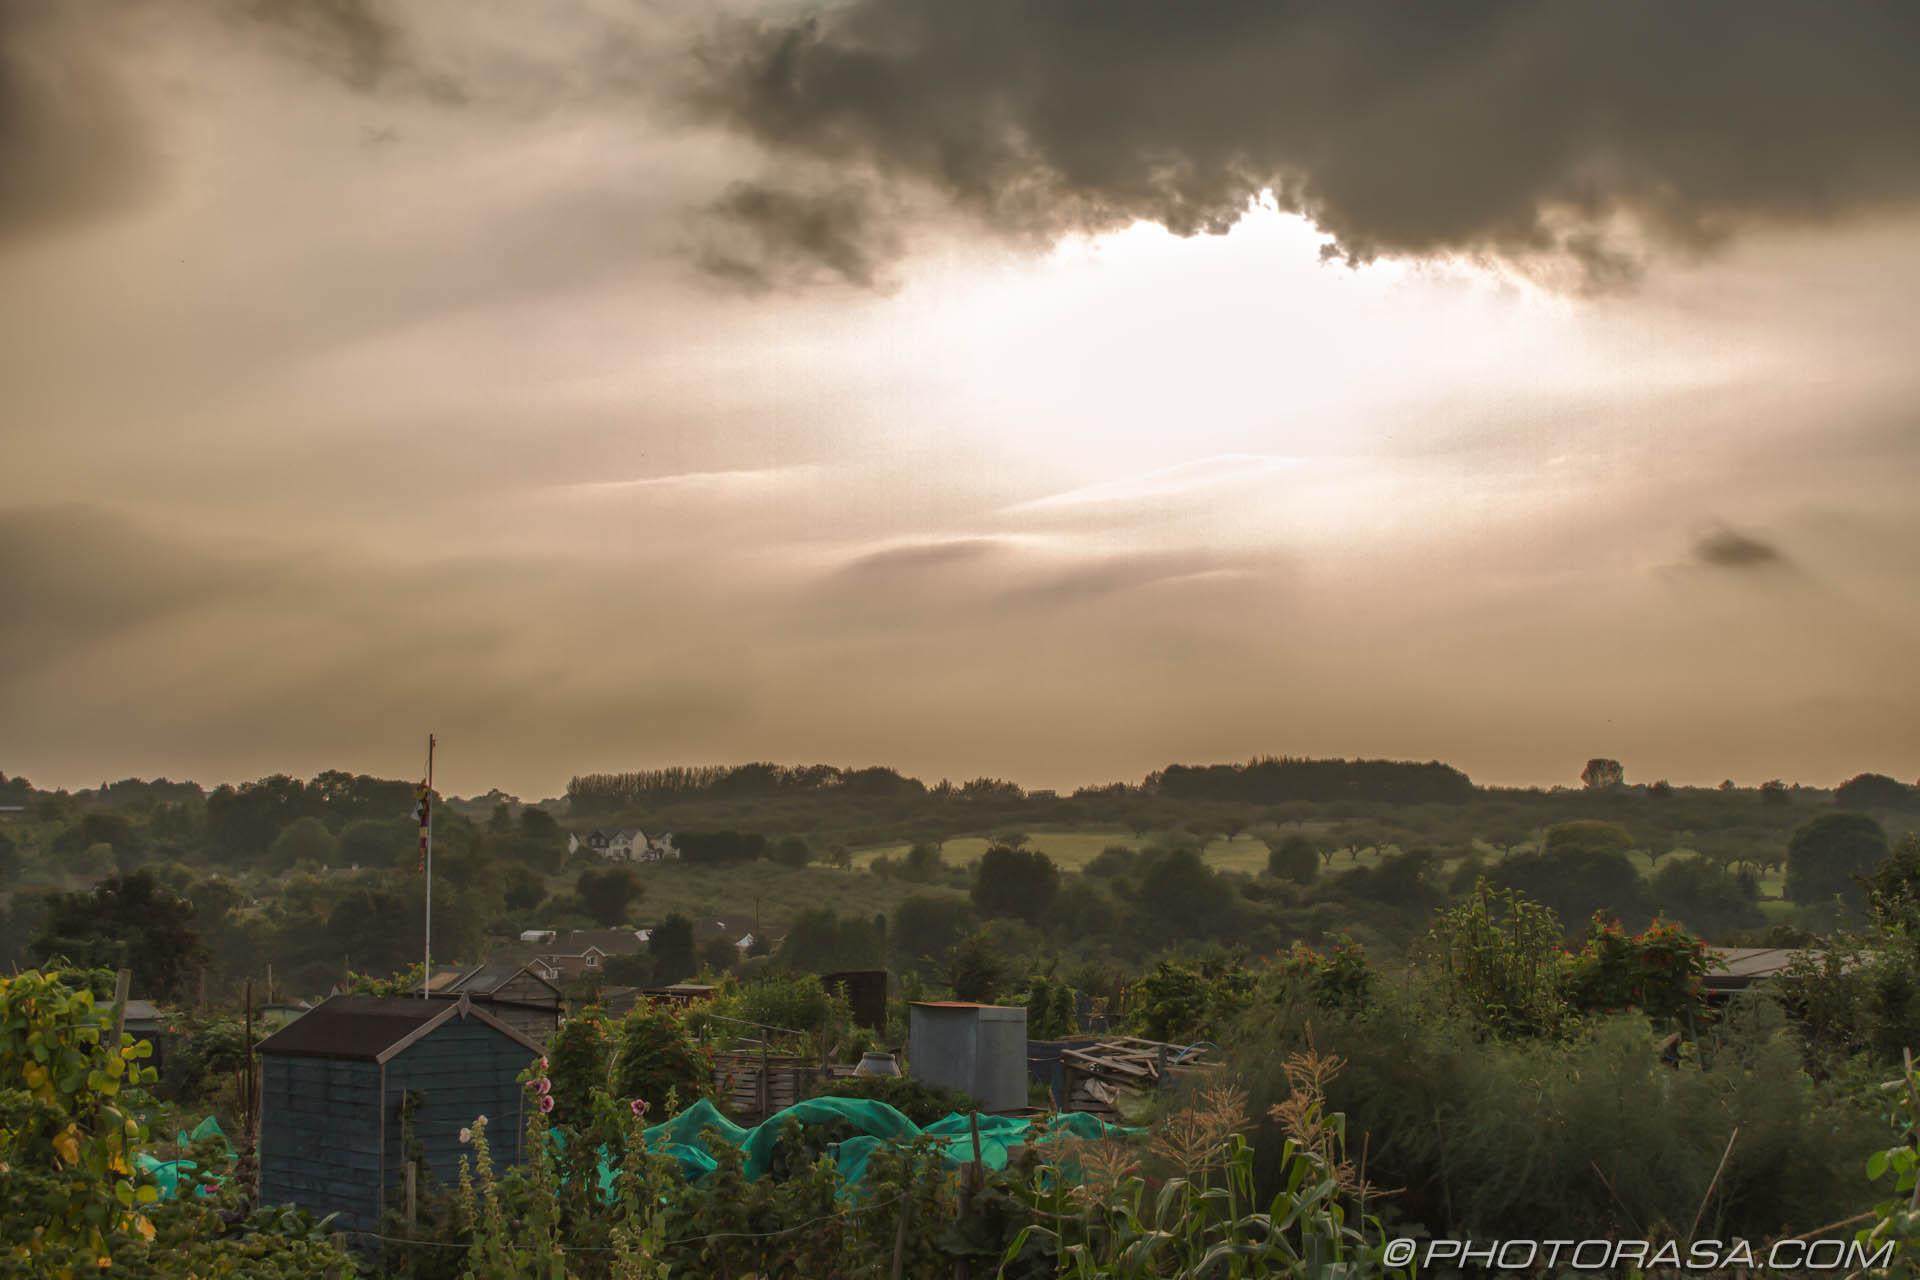 Sun Shining Through The Clouds Photorasa Free Hd Photos